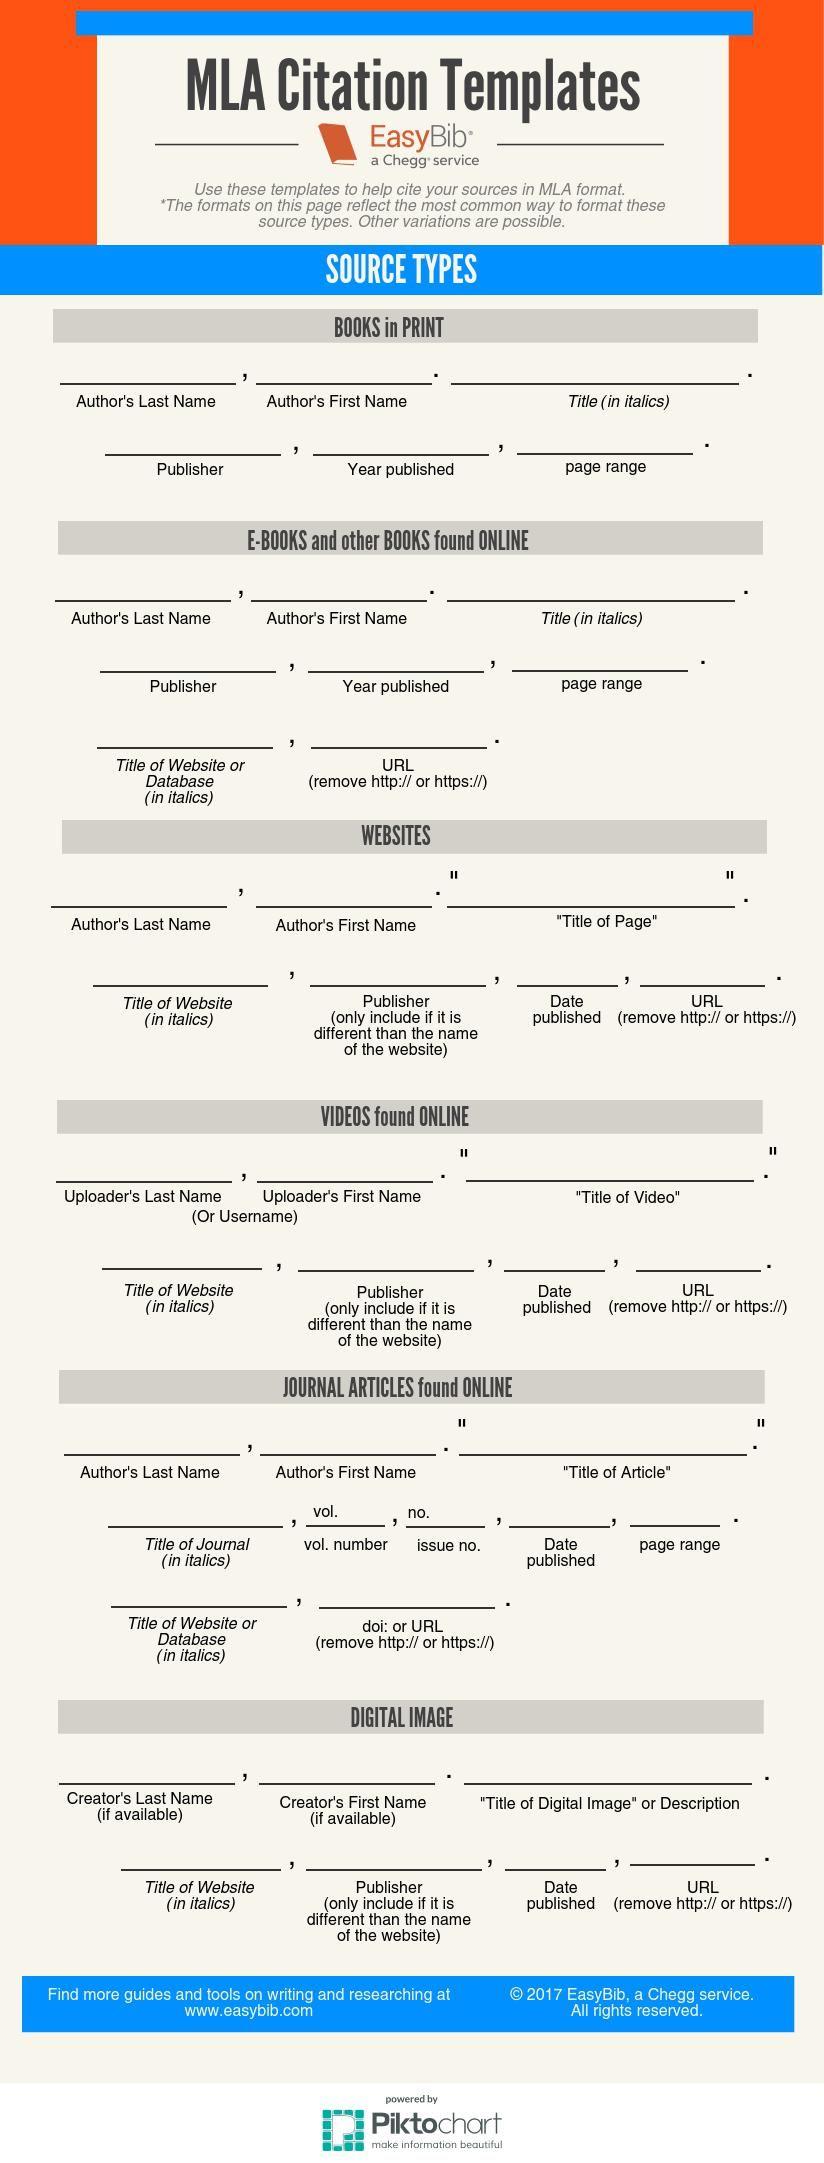 mla format citation templates teaching with technology pinterest